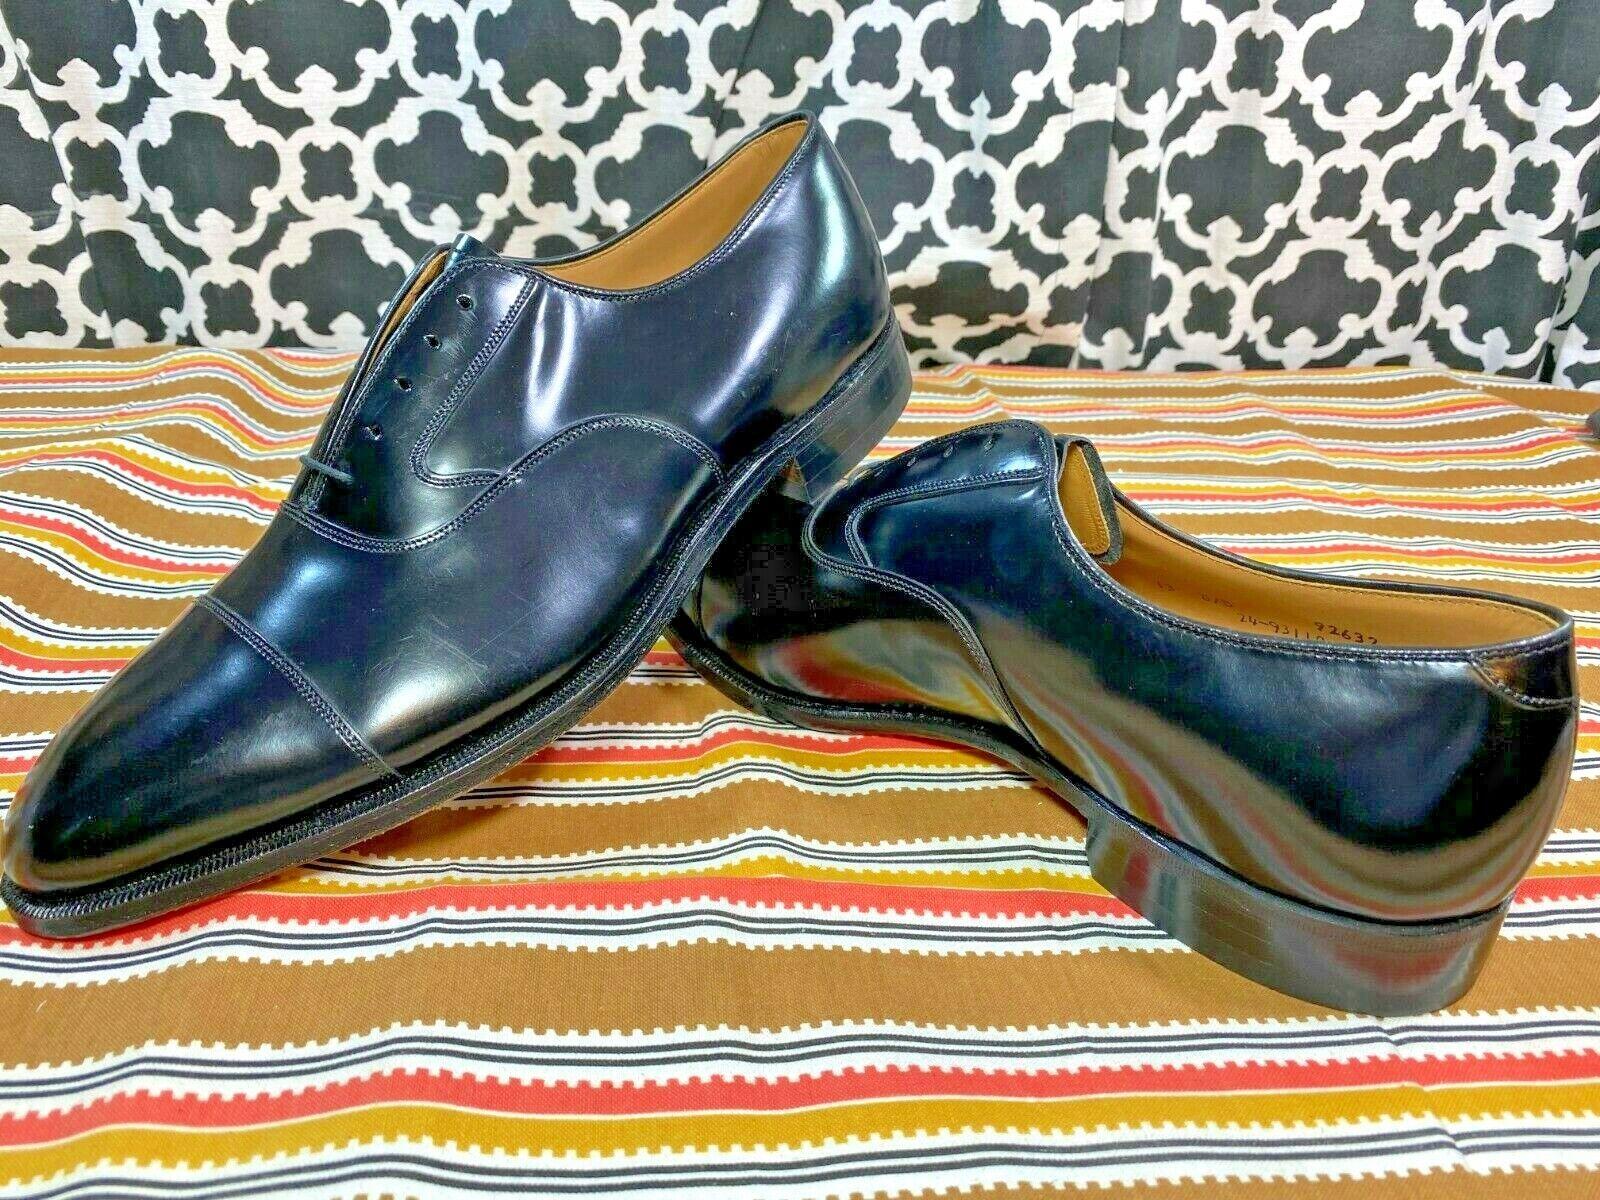 Johnston Murphy Limited Cushion System Black Captoe Dress Shoes - Sz. 13 D/B NWD